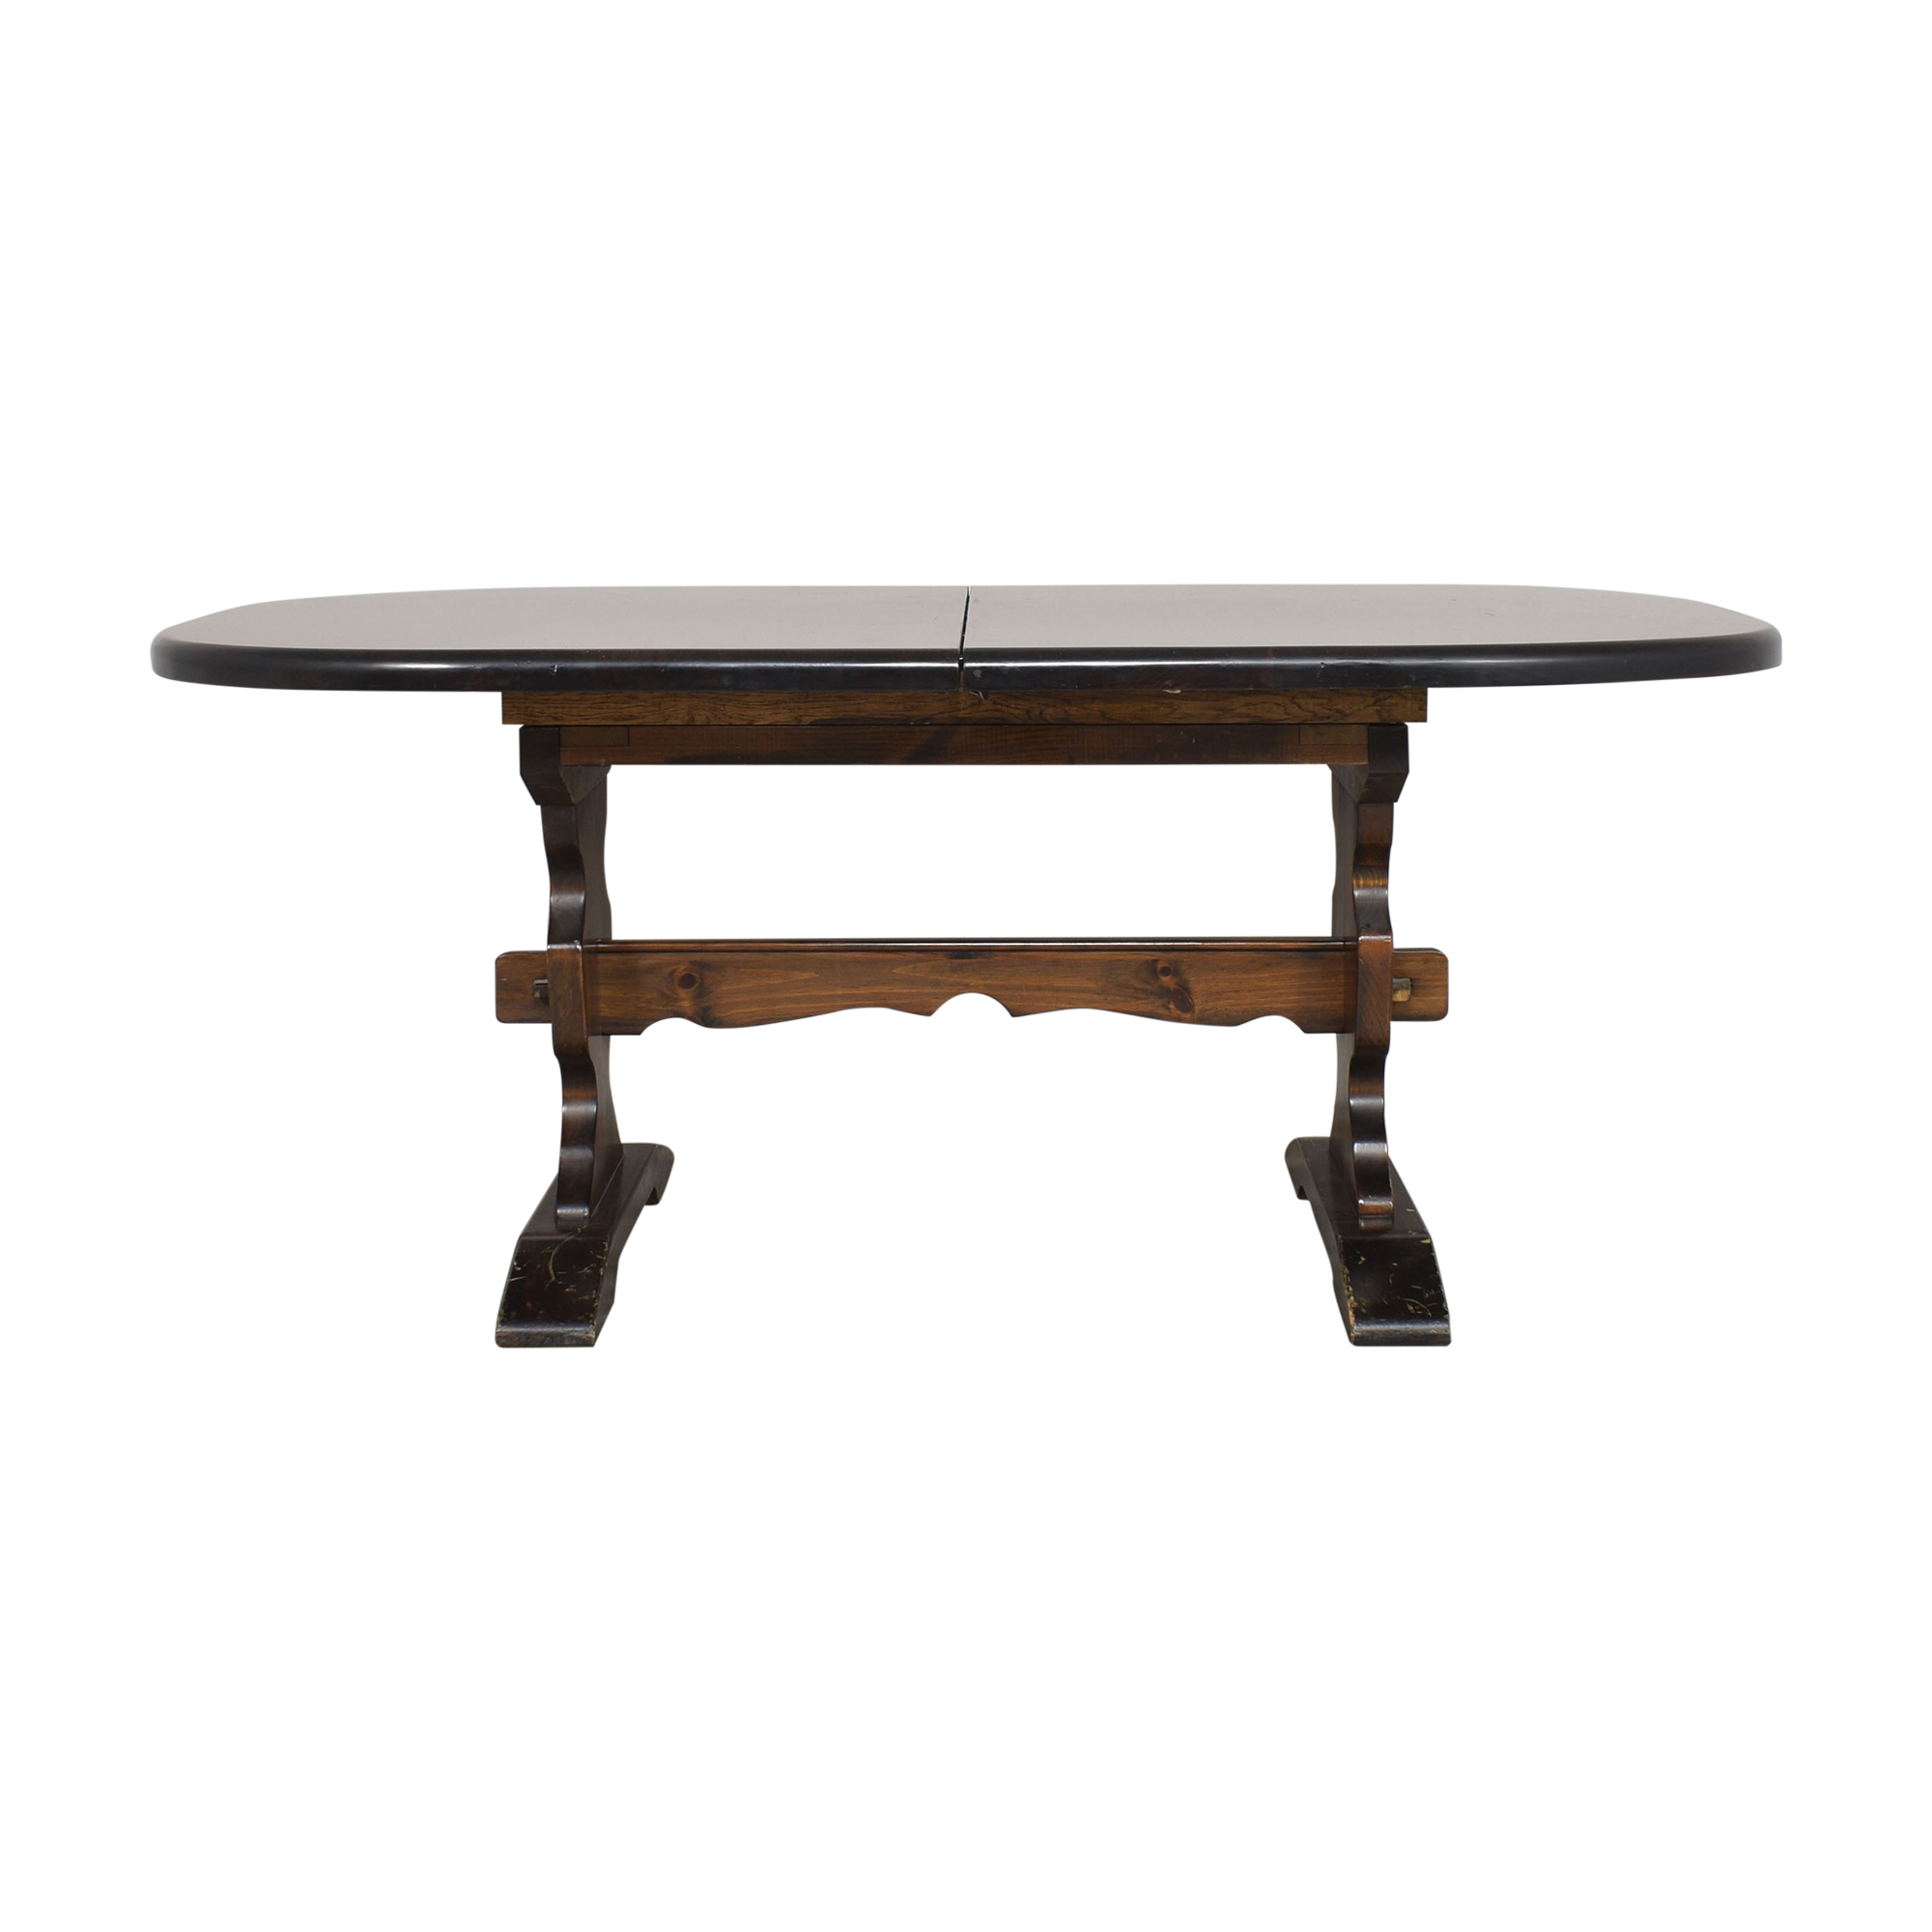 Bennington Pine Bennington Pine Extendable Trestle Dining Table dark brown